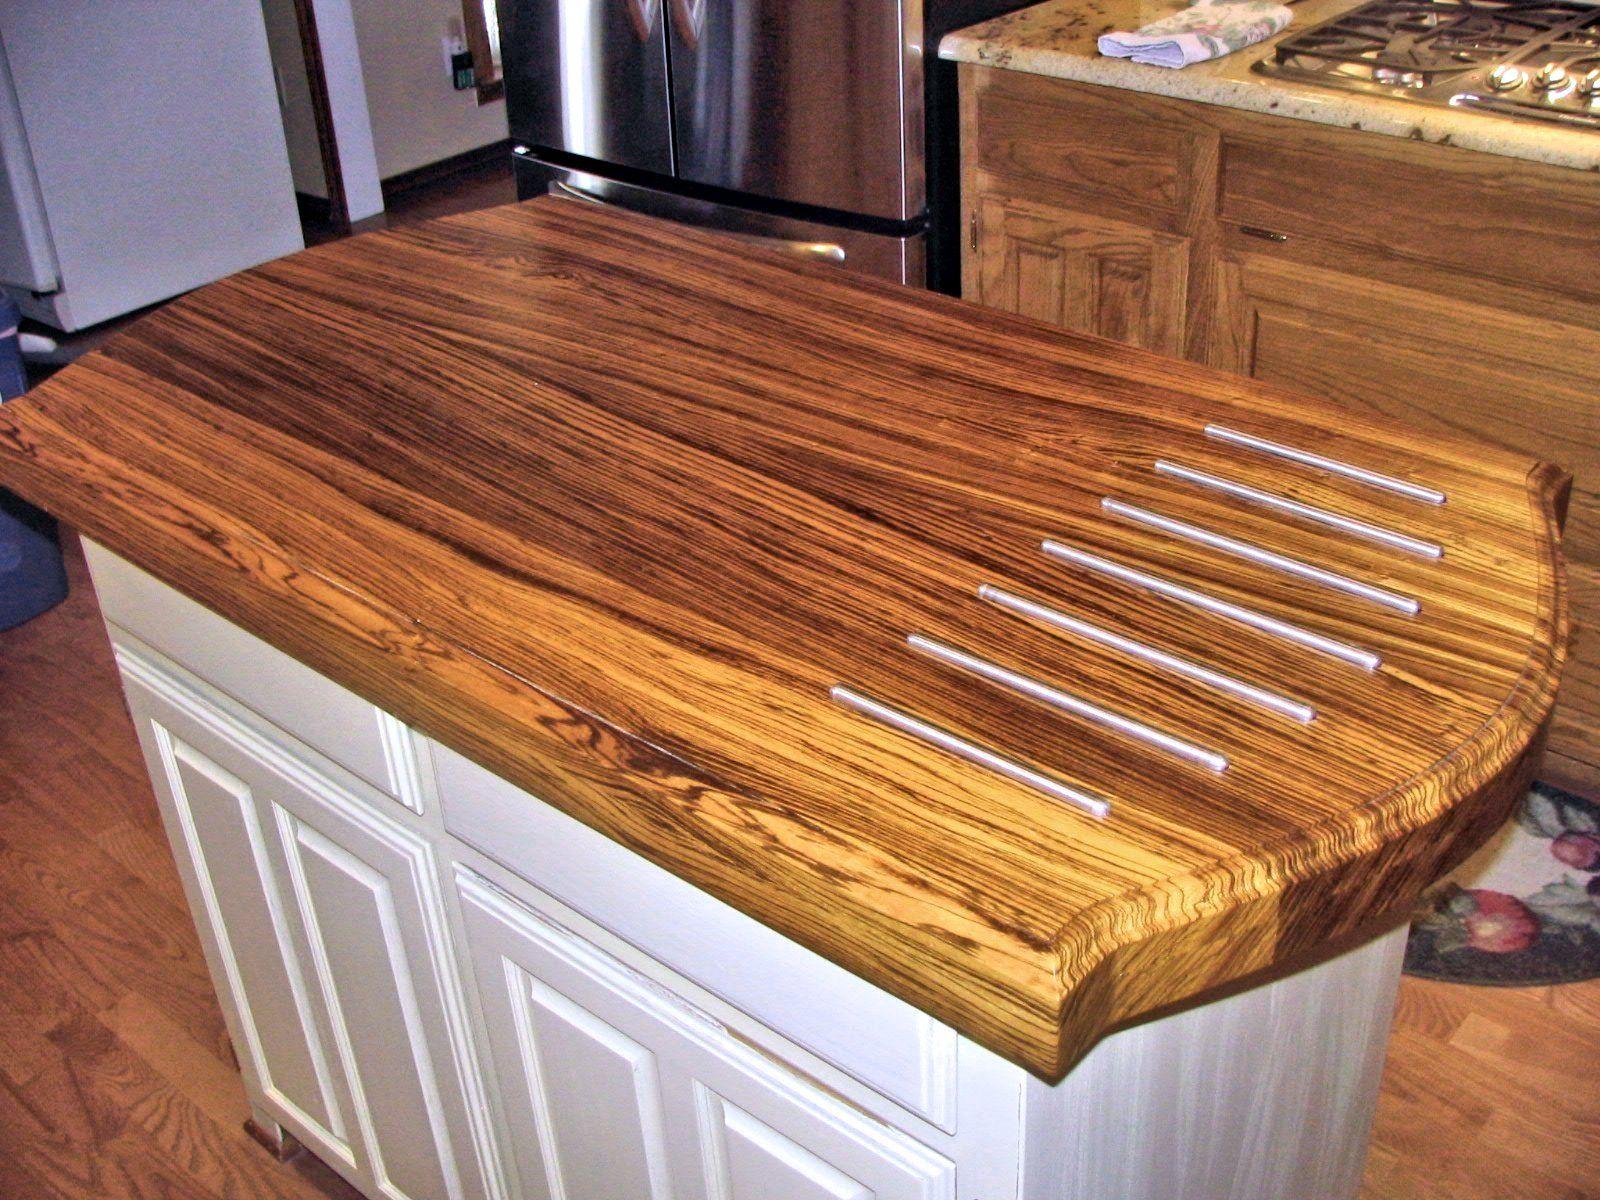 Zebrawood Face Grain Custom Wood Island Countertop